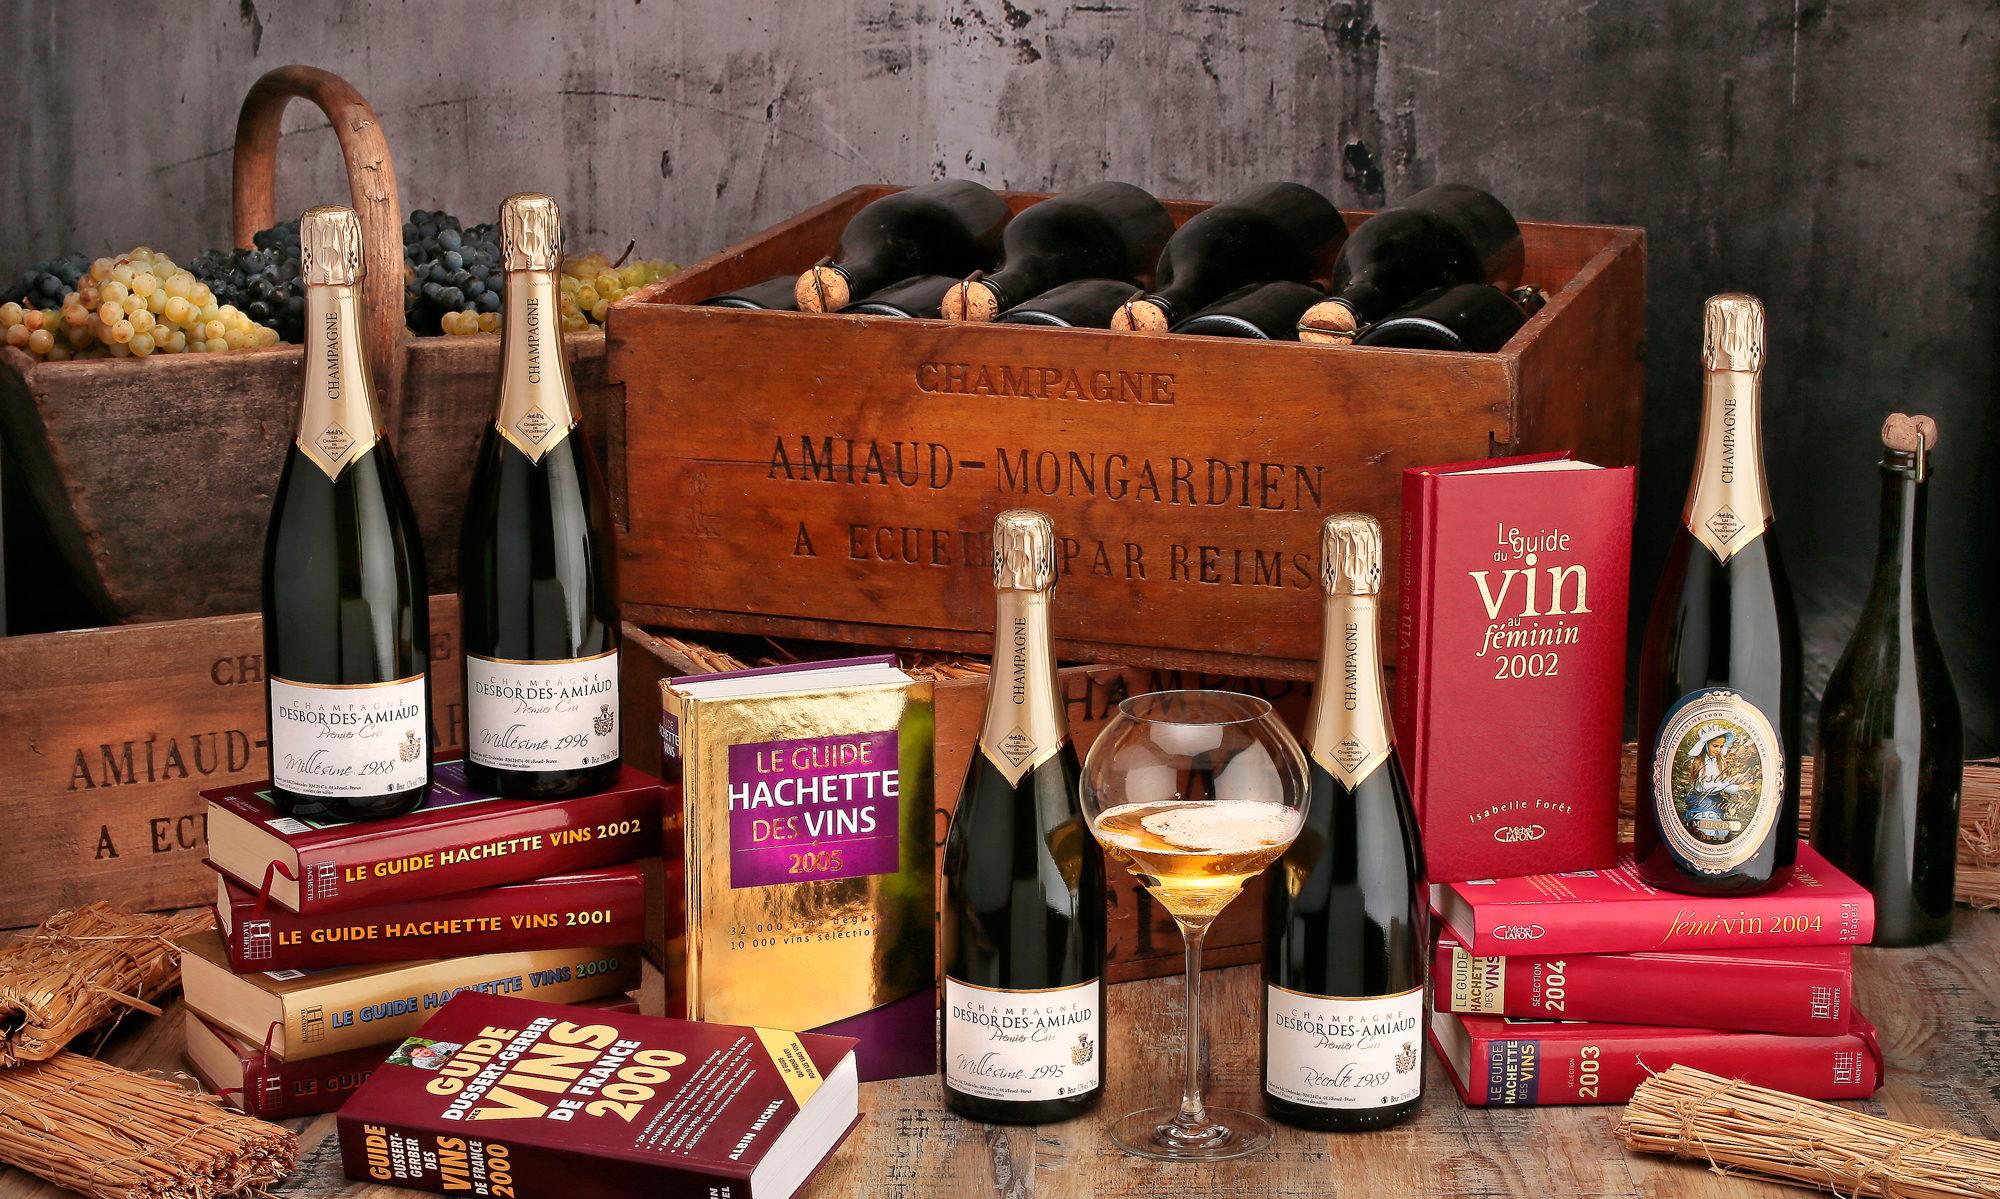 Champagne Desbordes-Amiaud